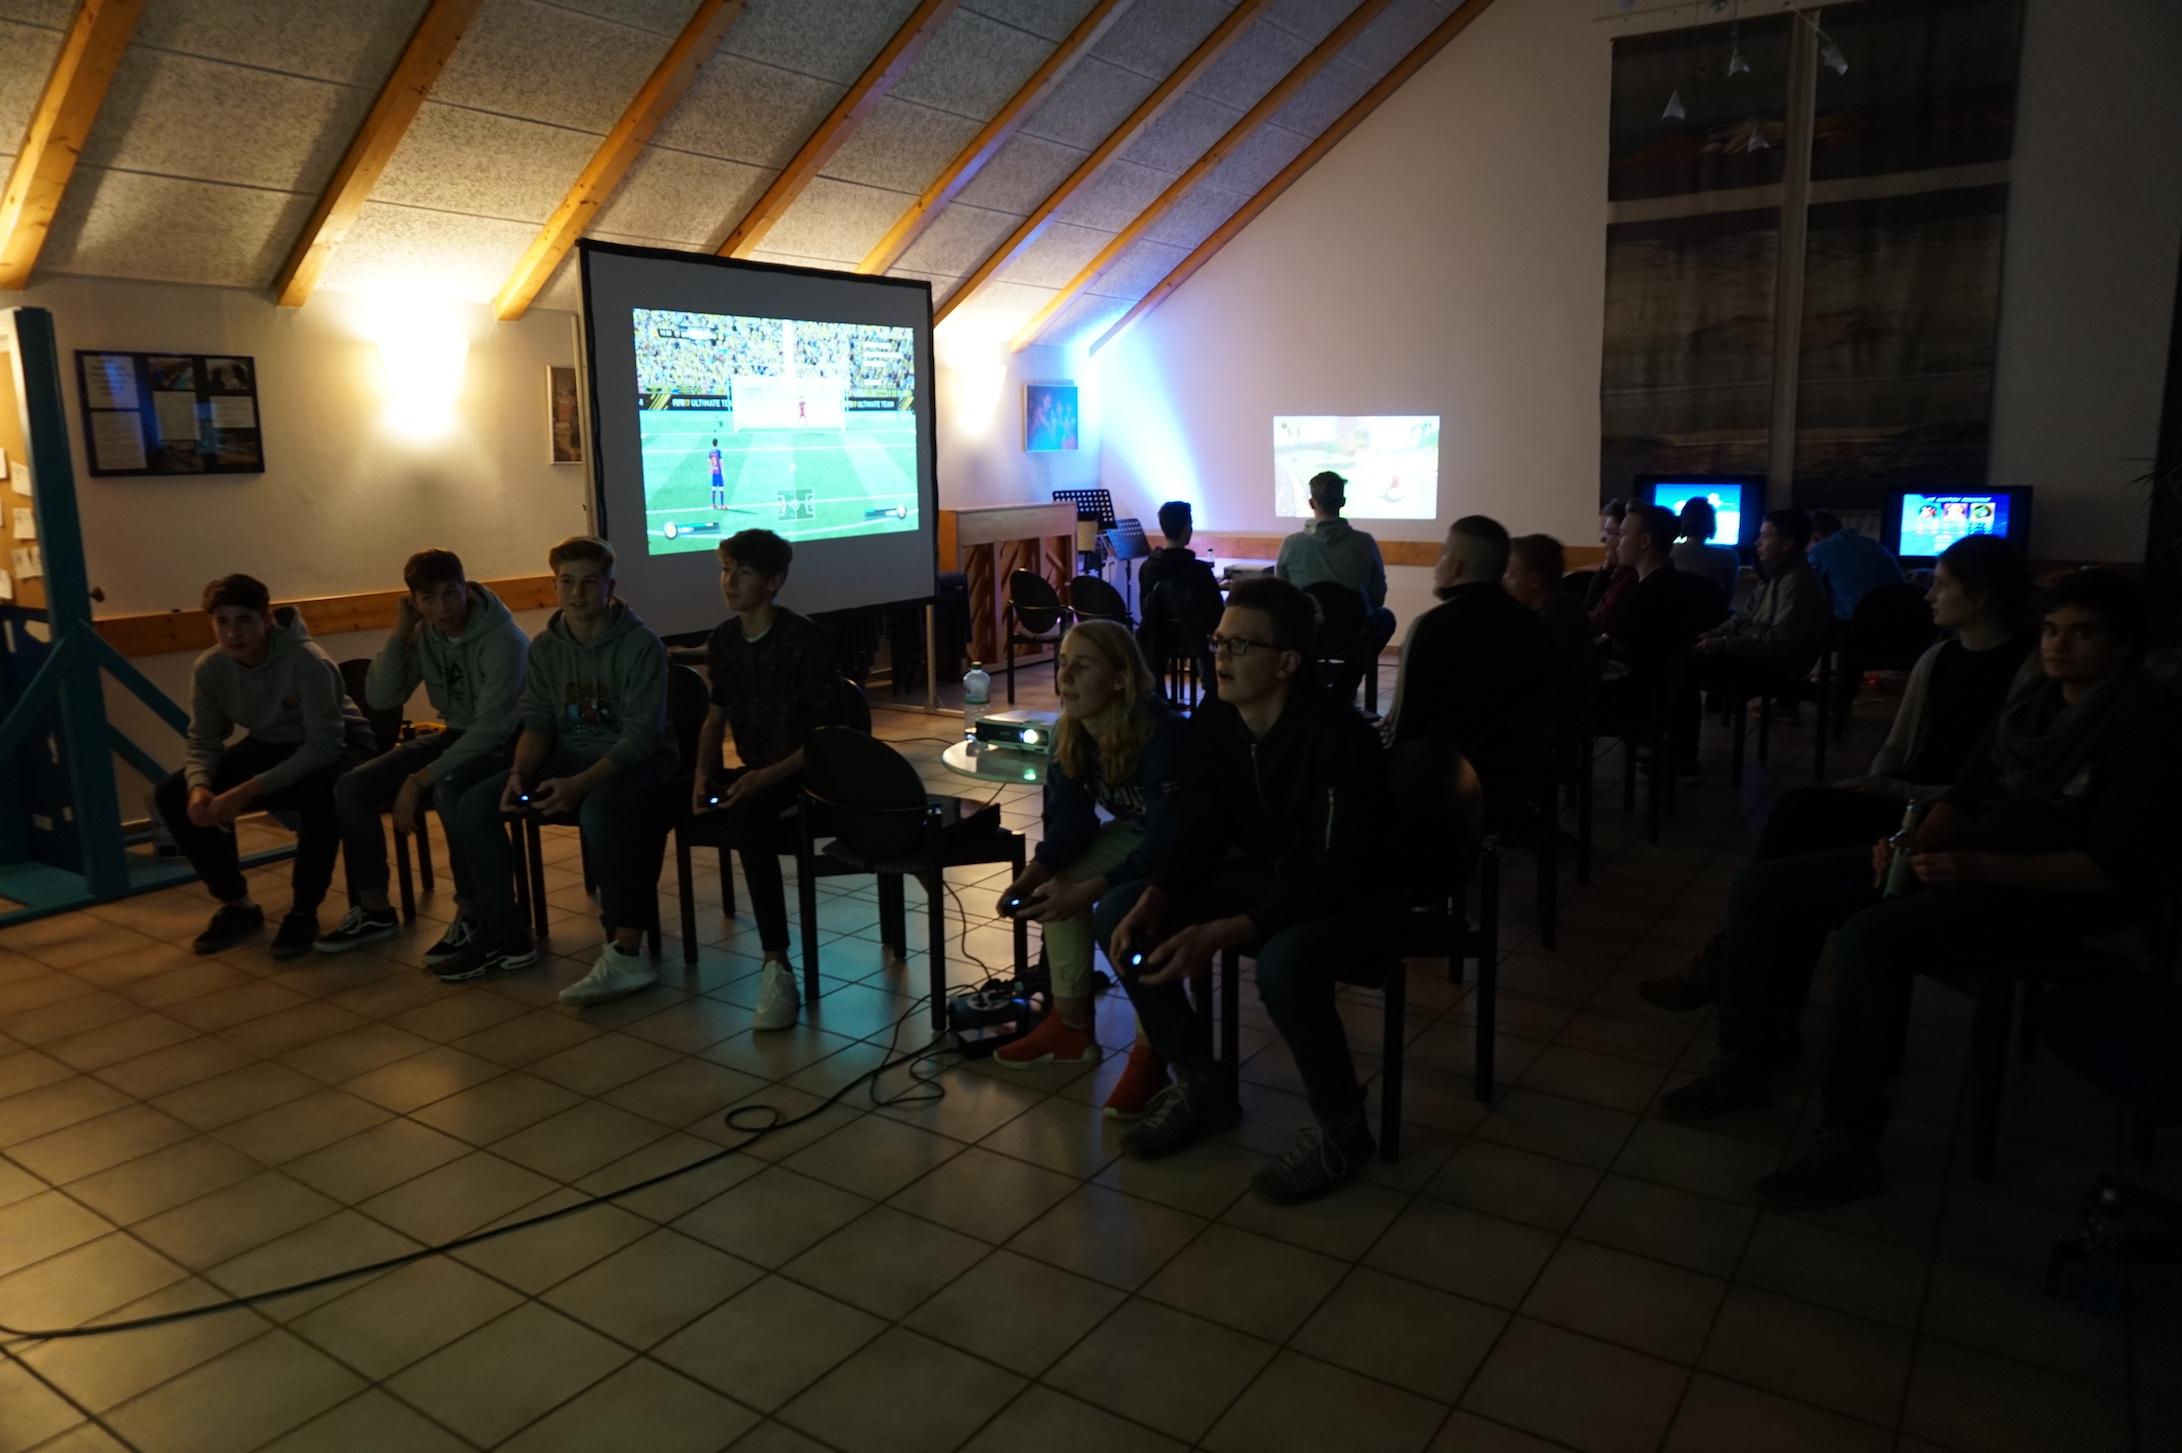 20171111 Zocker-Turnier (12)